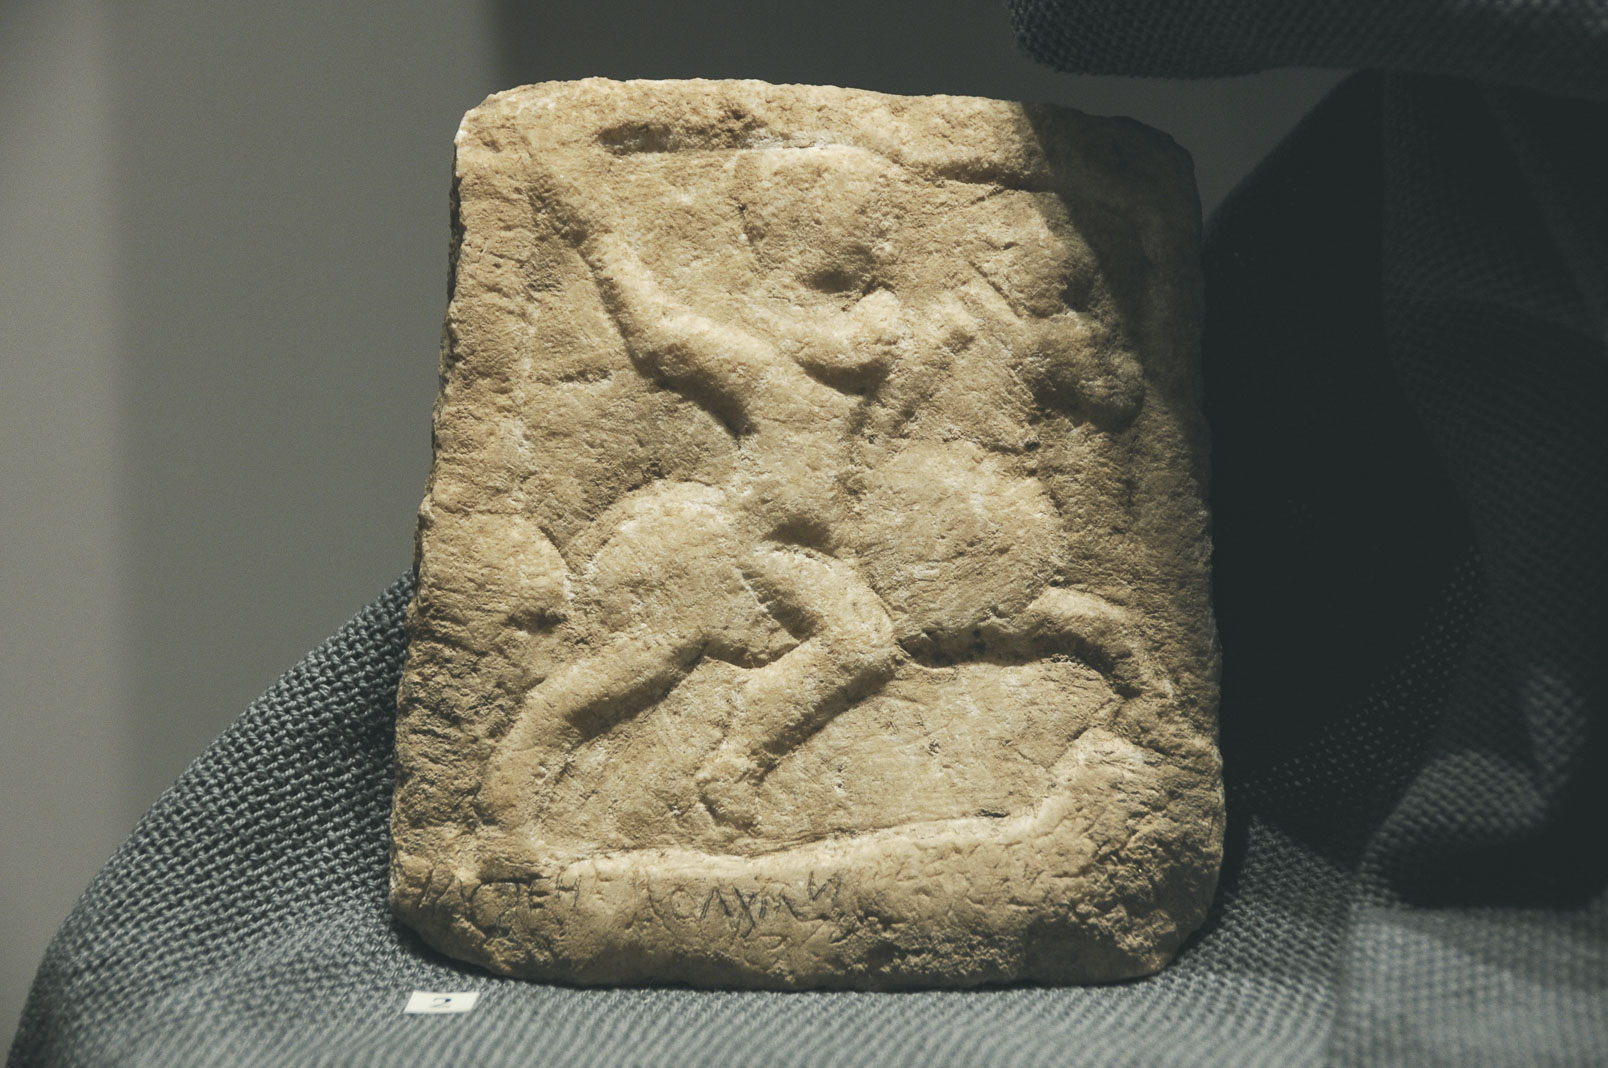 troyan-museum-jivotat-na-edna-idea-44